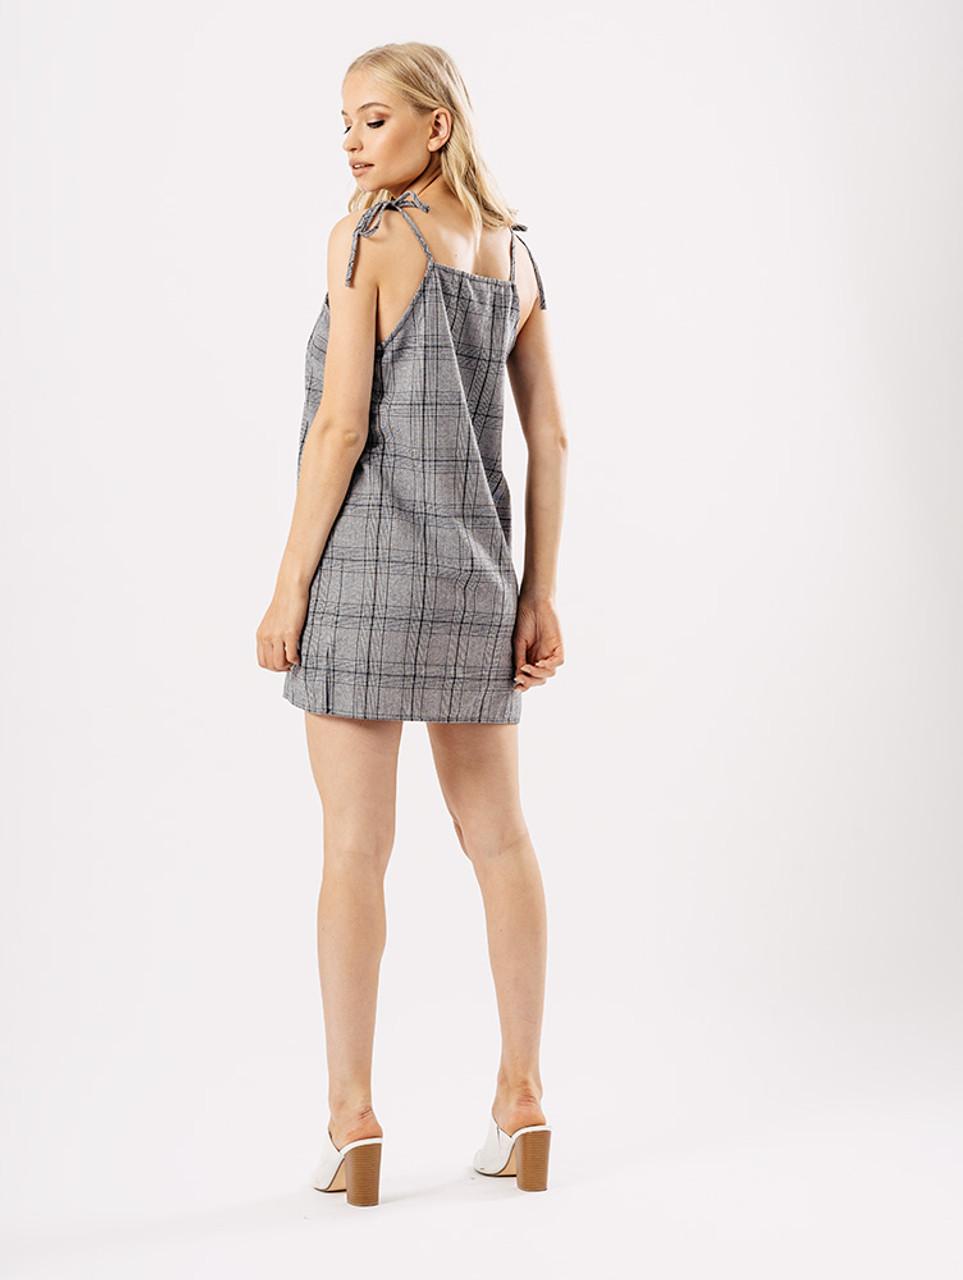 Gingham Check Print Summer Mini Dress